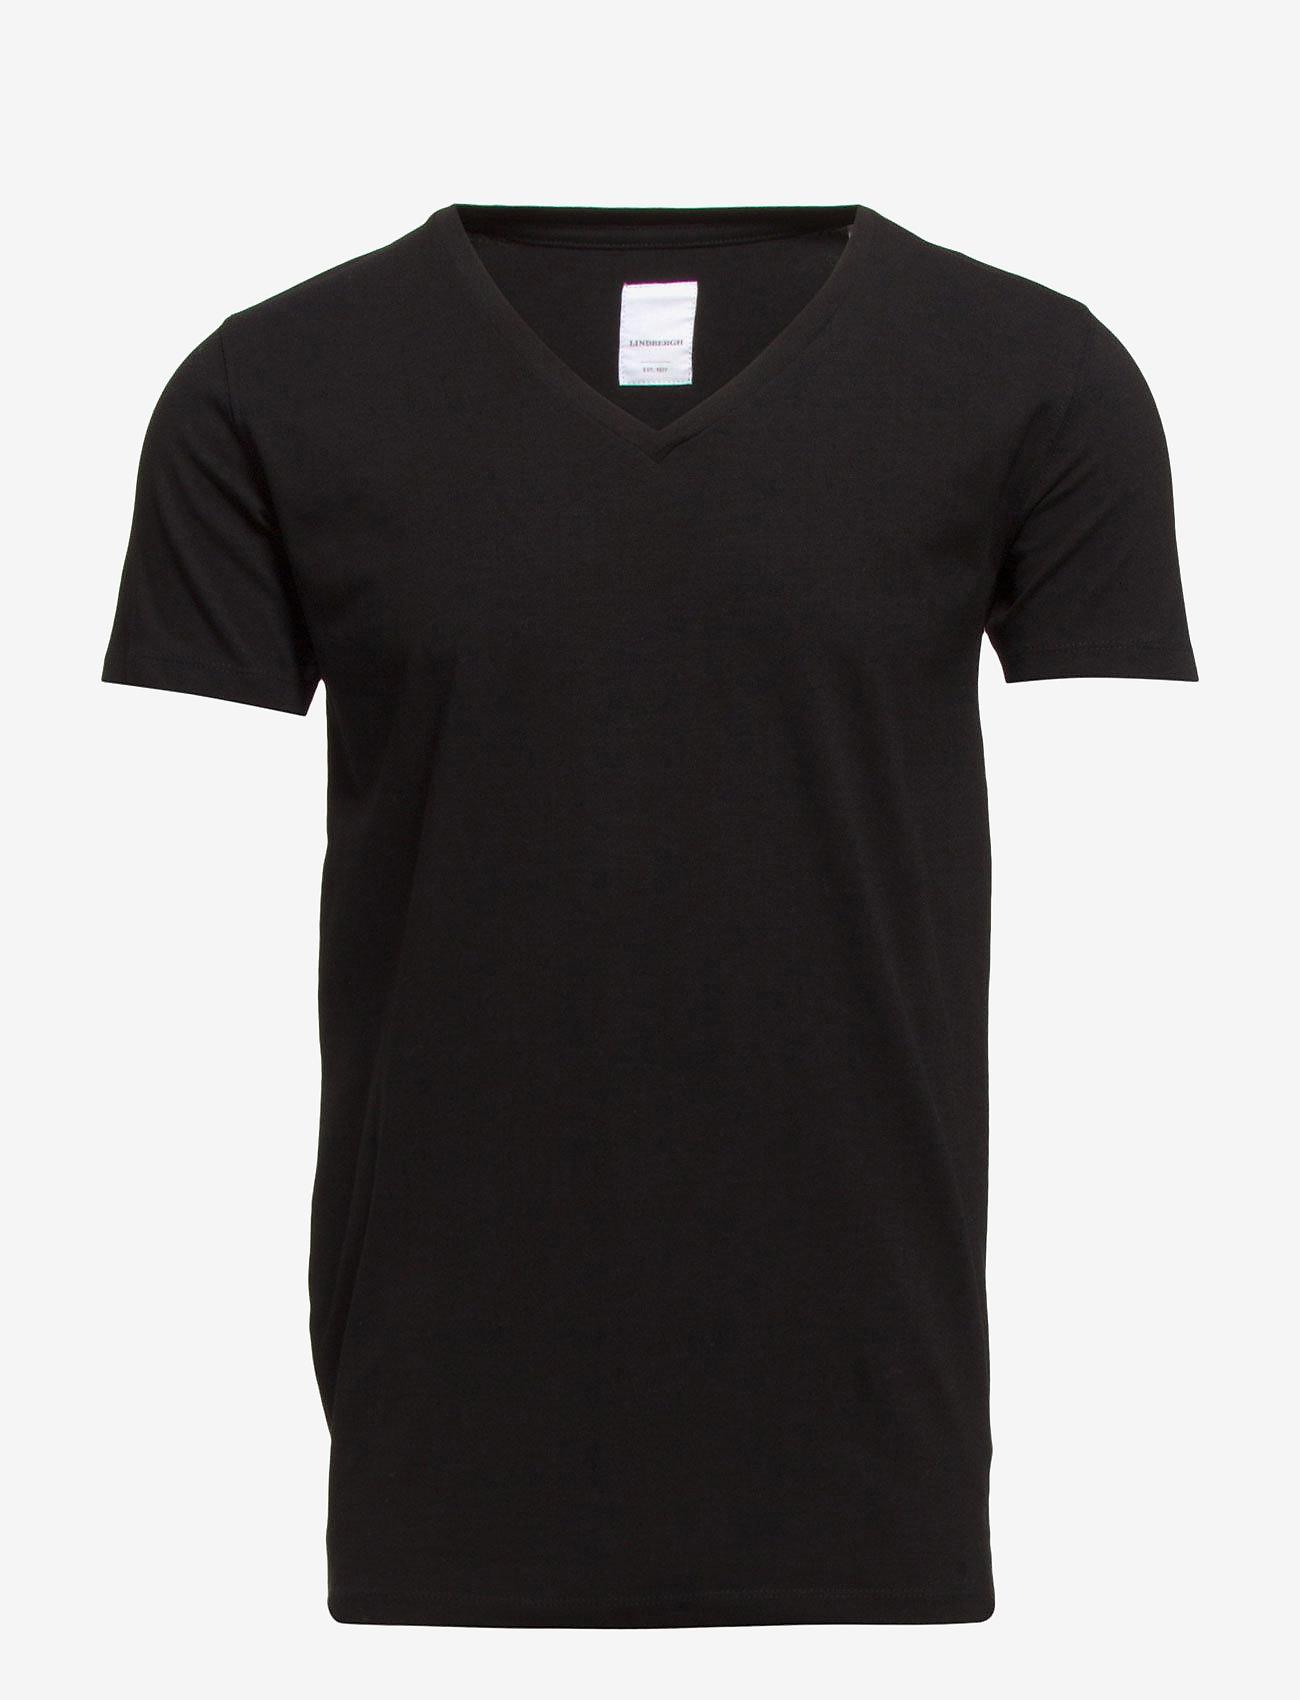 Lindbergh - Mens stretch v-neck tee s/s - lyhythihaiset - black